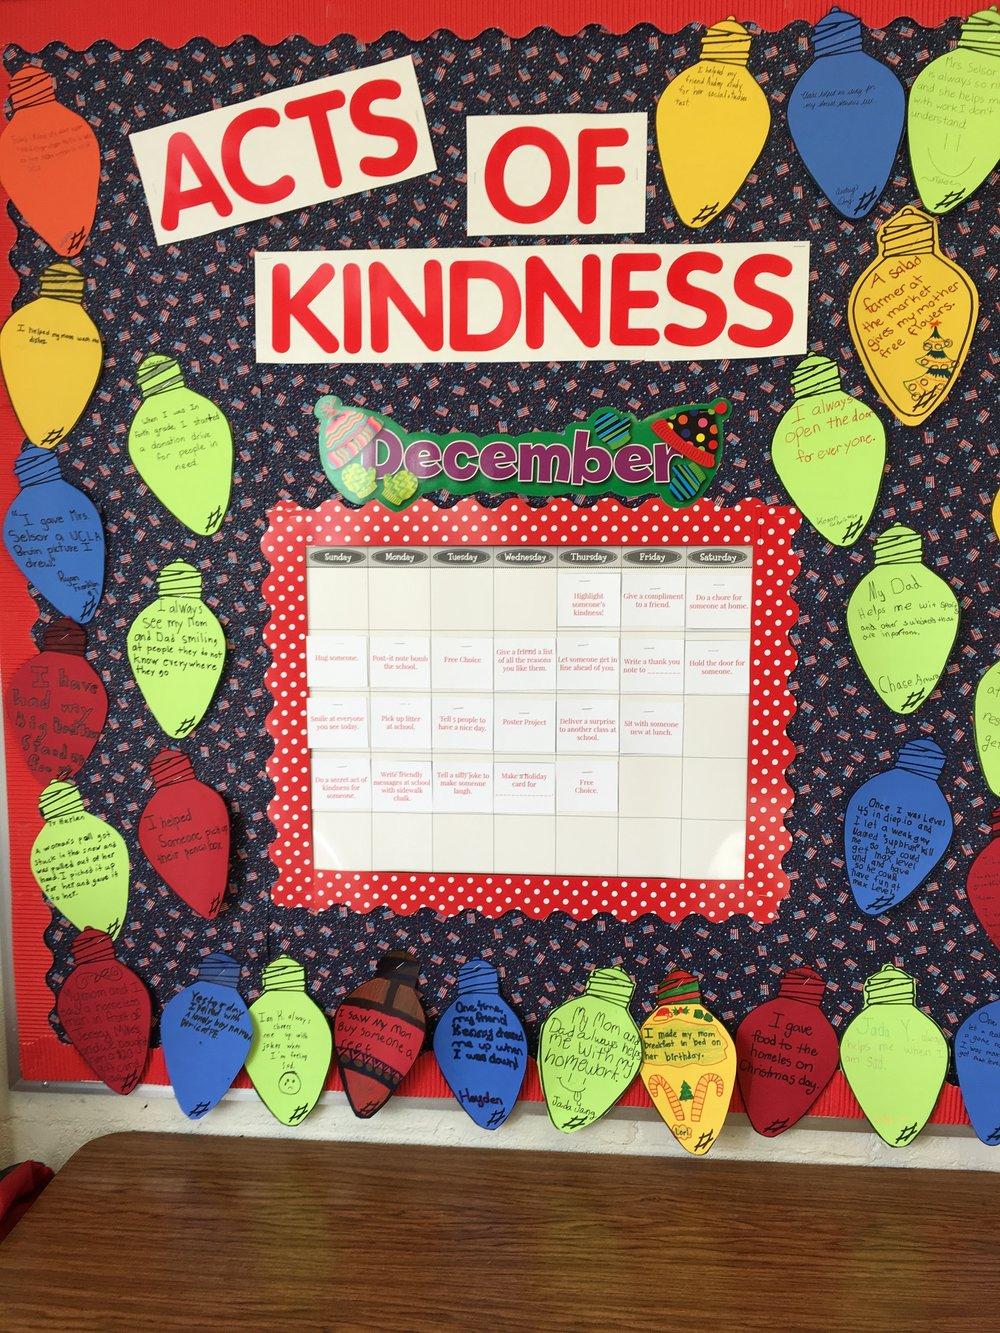 Acts of kindness December calendar.